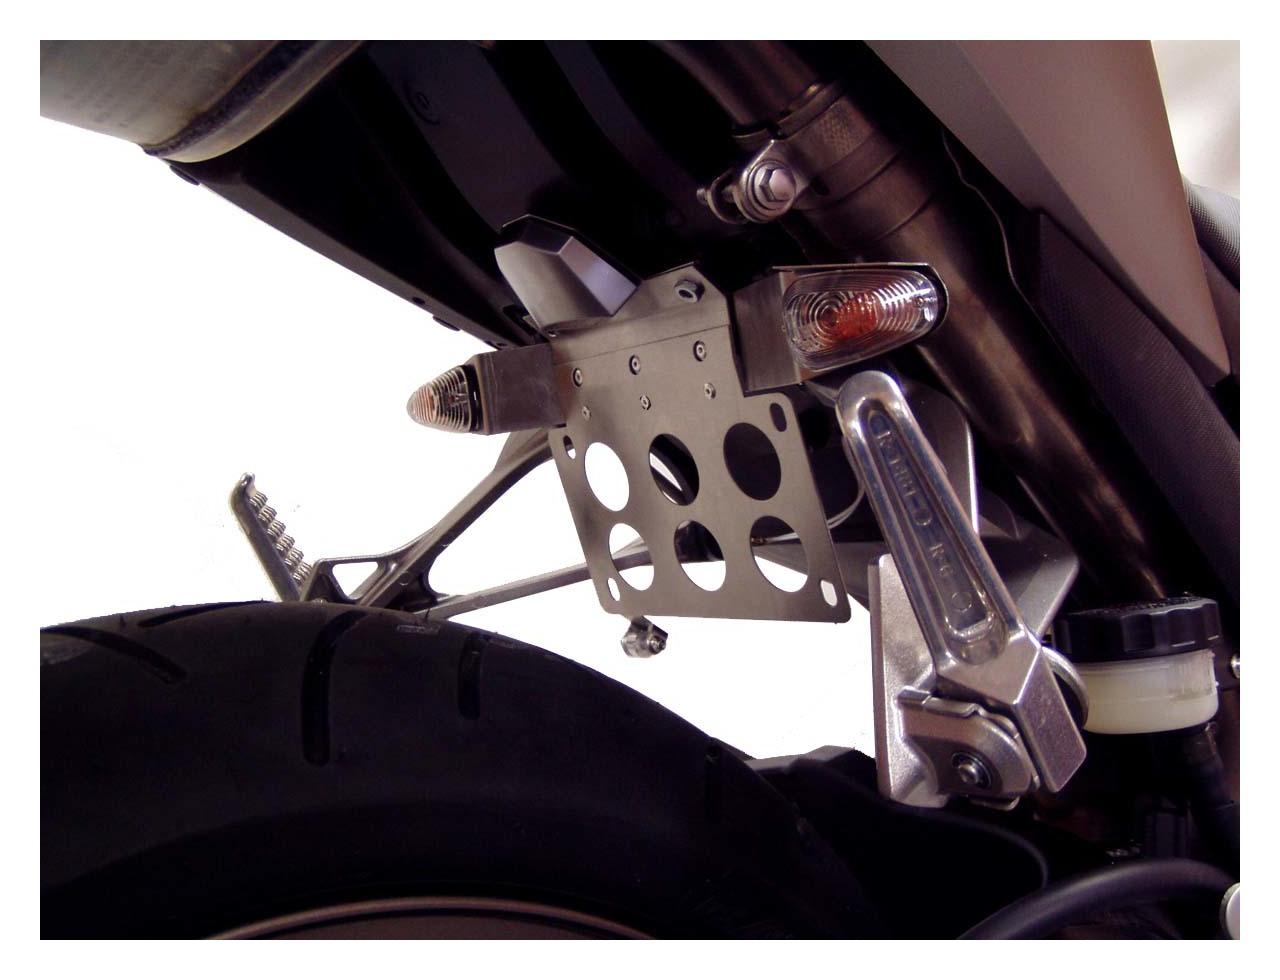 Competition Werkes Fender Eliminator Kit Kawasaki Zx6r Zx636 2005 2007 Wiring Harness 2006 10 1399 Off Revzilla